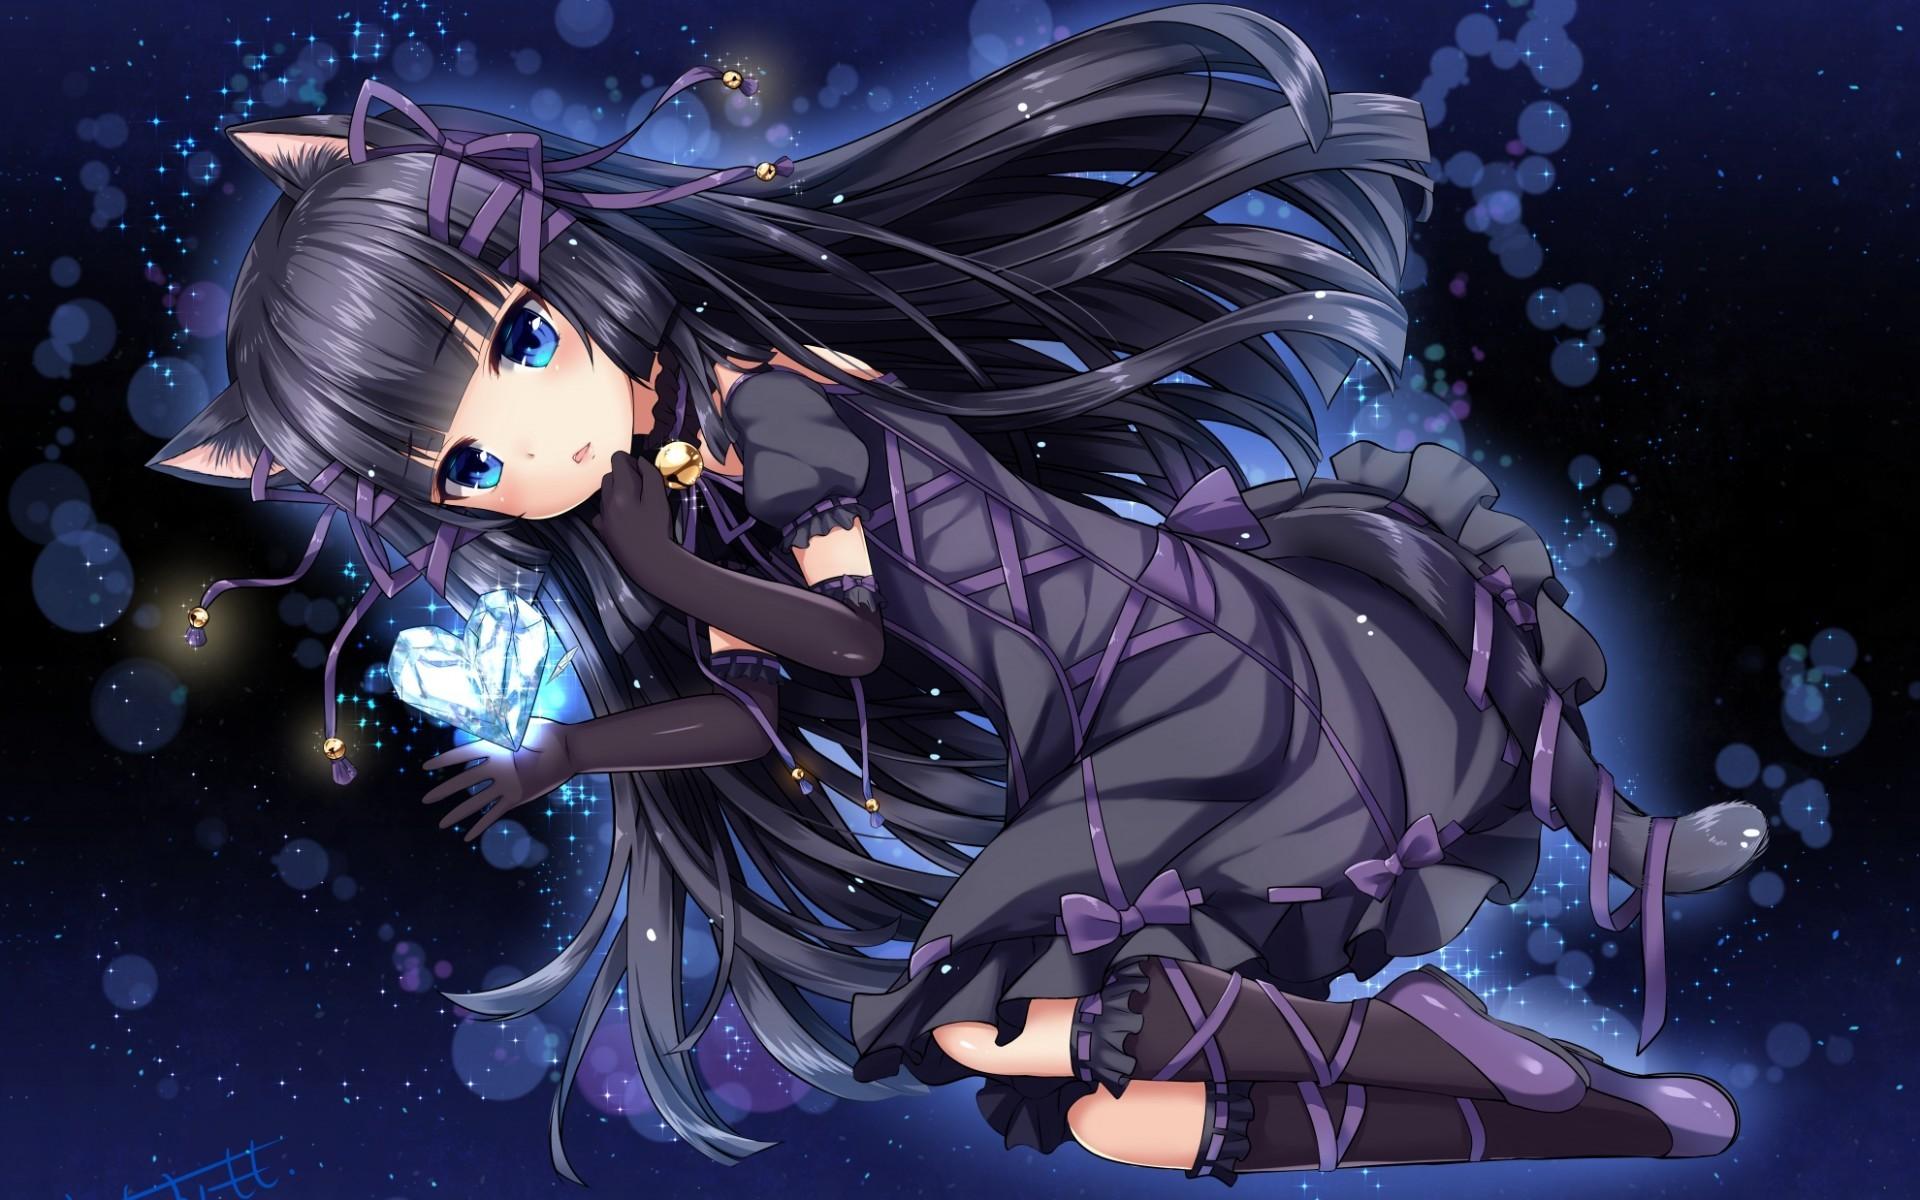 anime cat girl wallpaper,cg artwork,anime,cartoon,fictional character,illustration